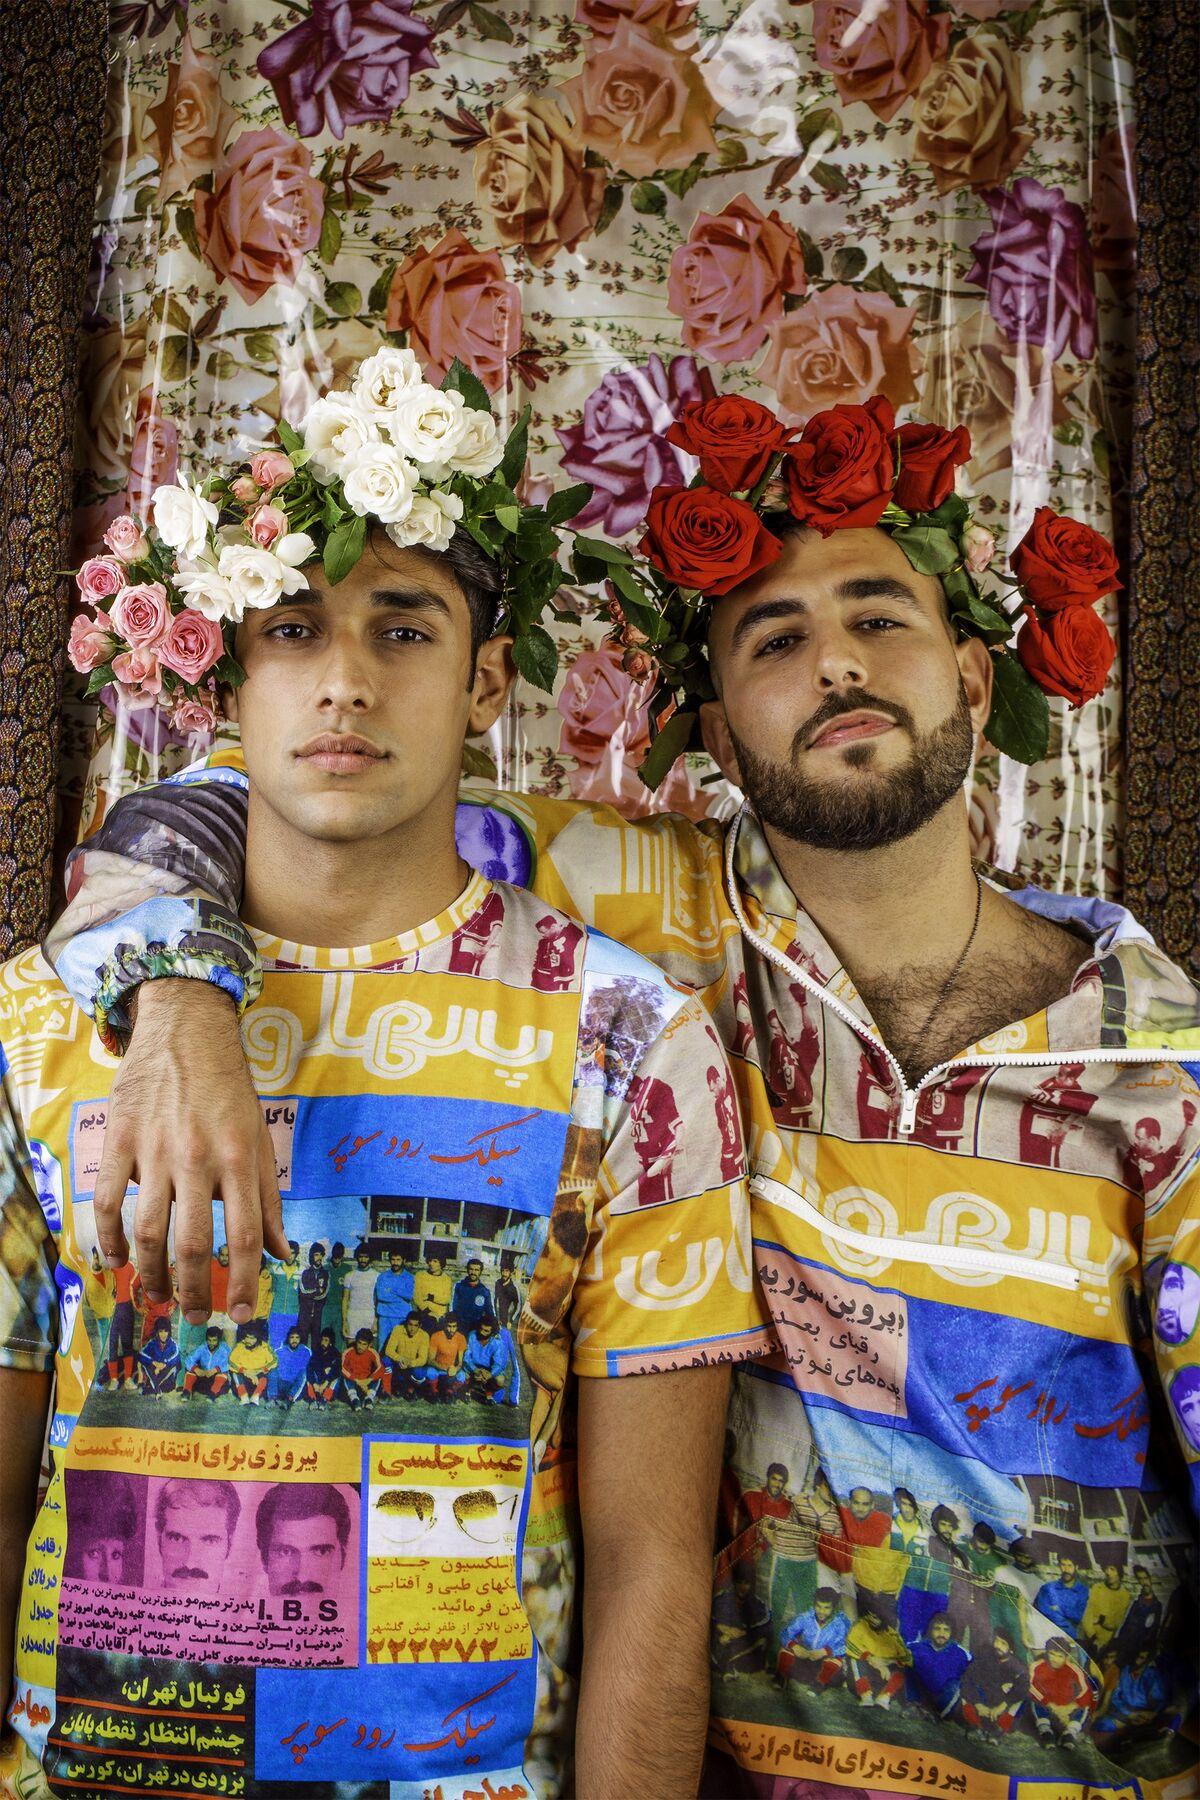 Hushidar Mortezaie and Jiyan Zandi, The Brotherhood, 2018. Courtesy of the artists.